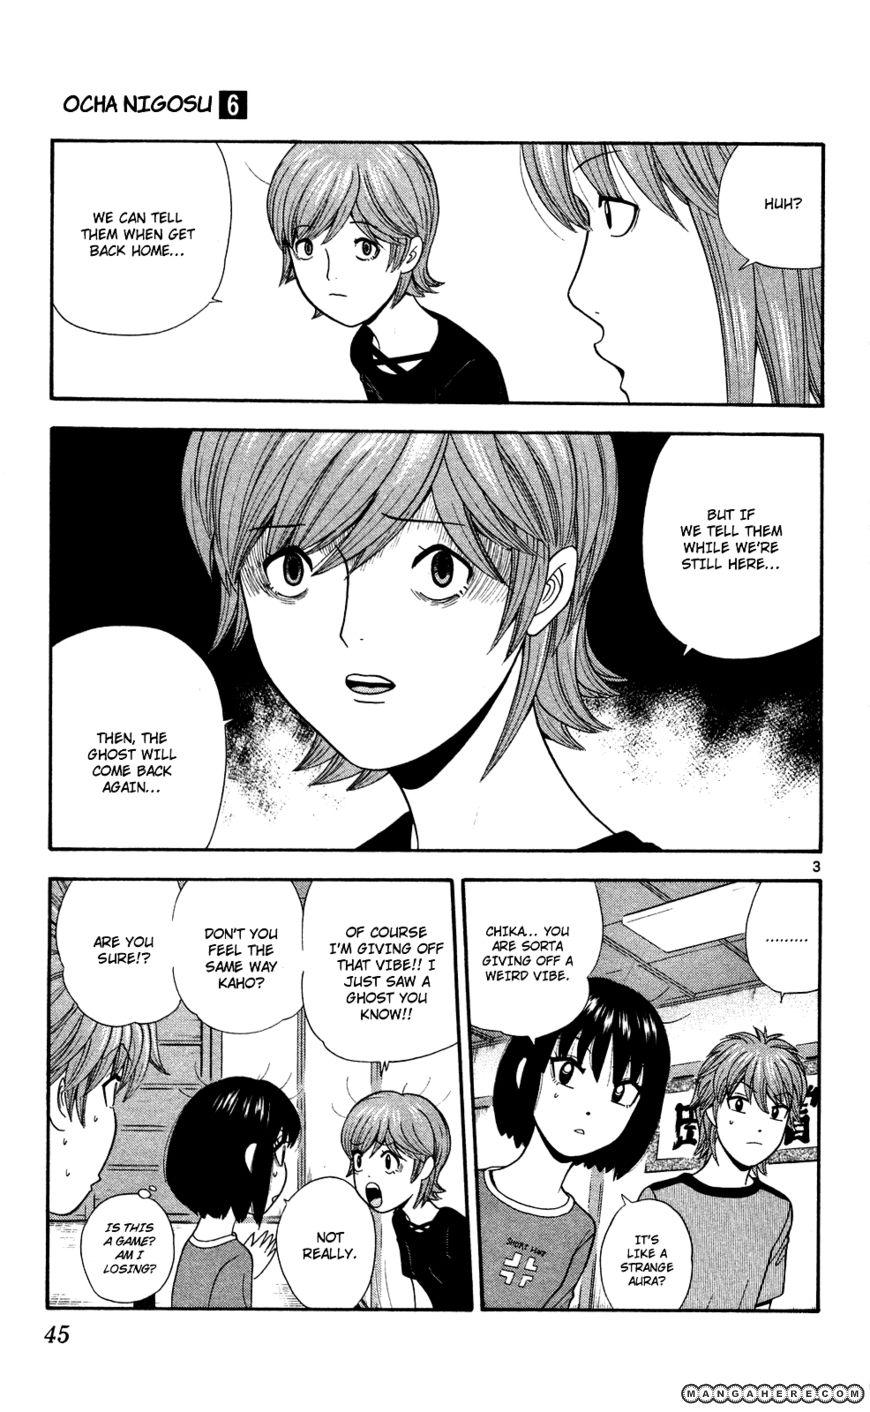 Ocha Nigosu 52 Page 3